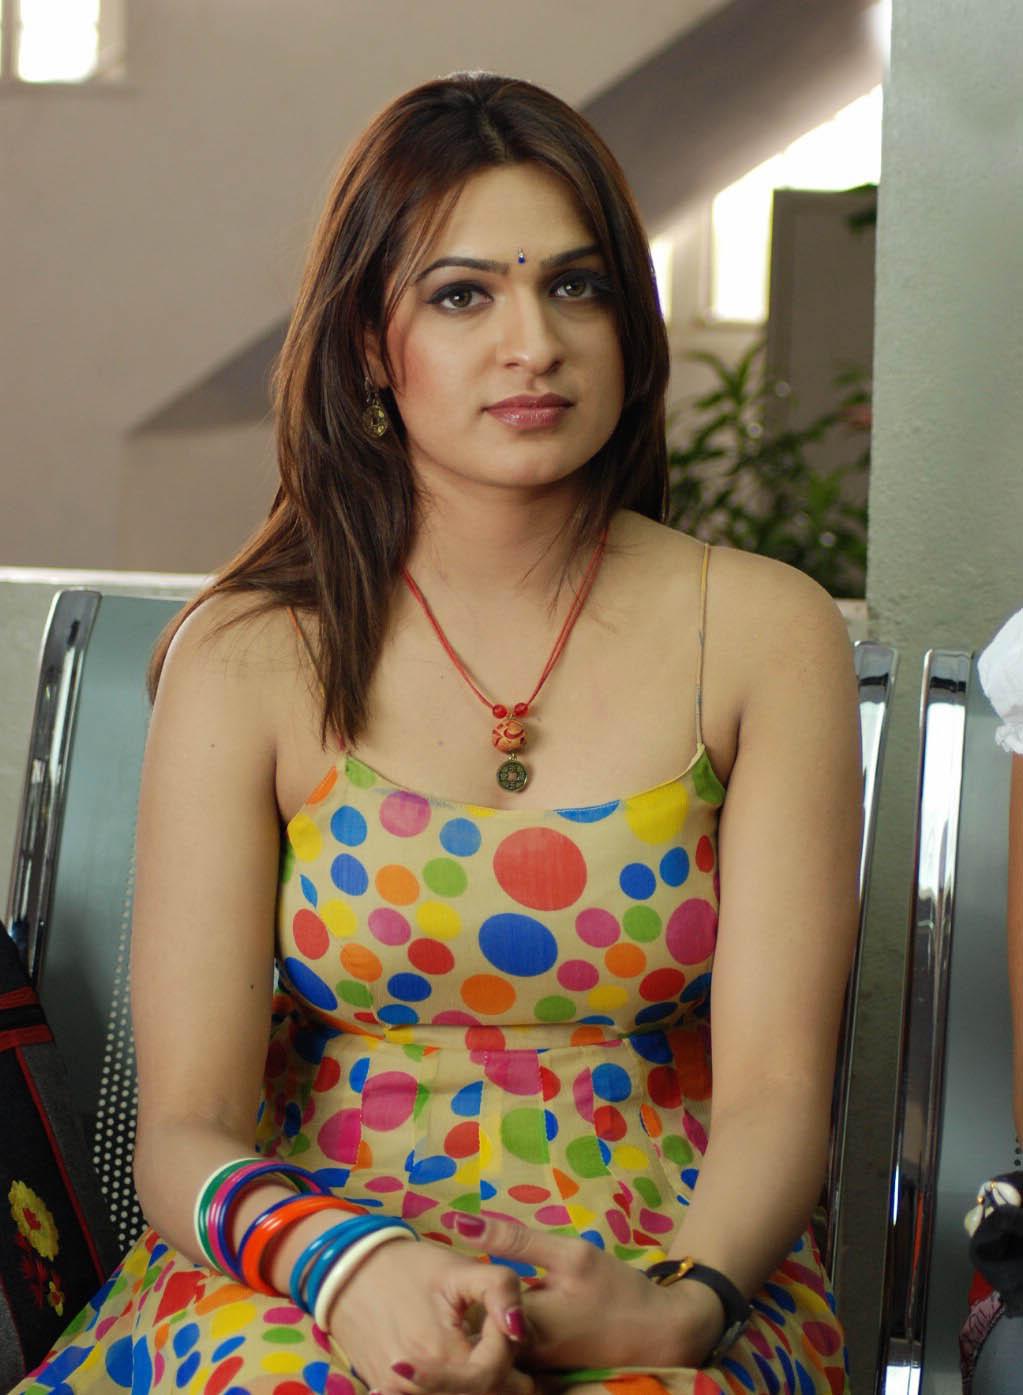 hot gallery - hot sexy photo gallery of telugu actress | telugu